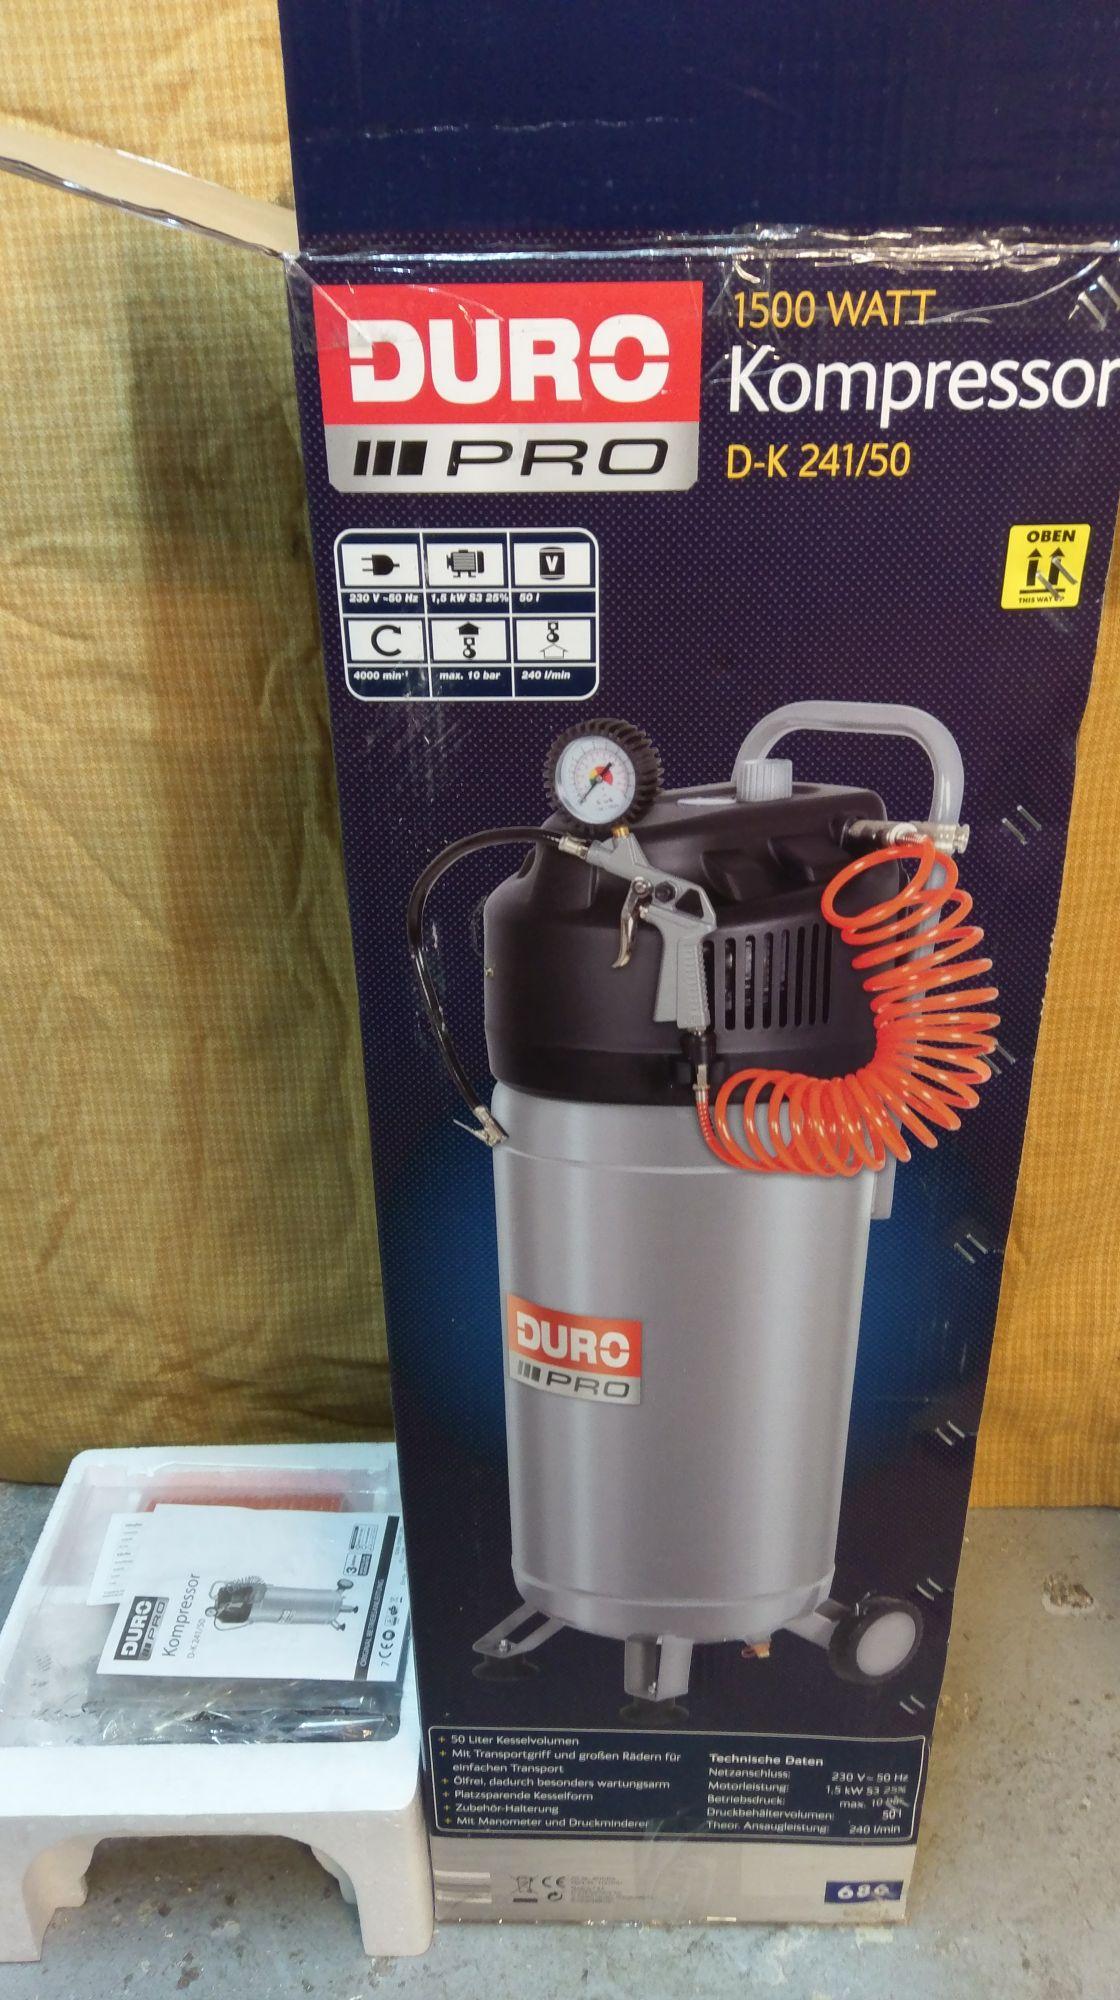 Duro Pro Kompressor D-K 241/50 - Lokal bei Aldi Nord